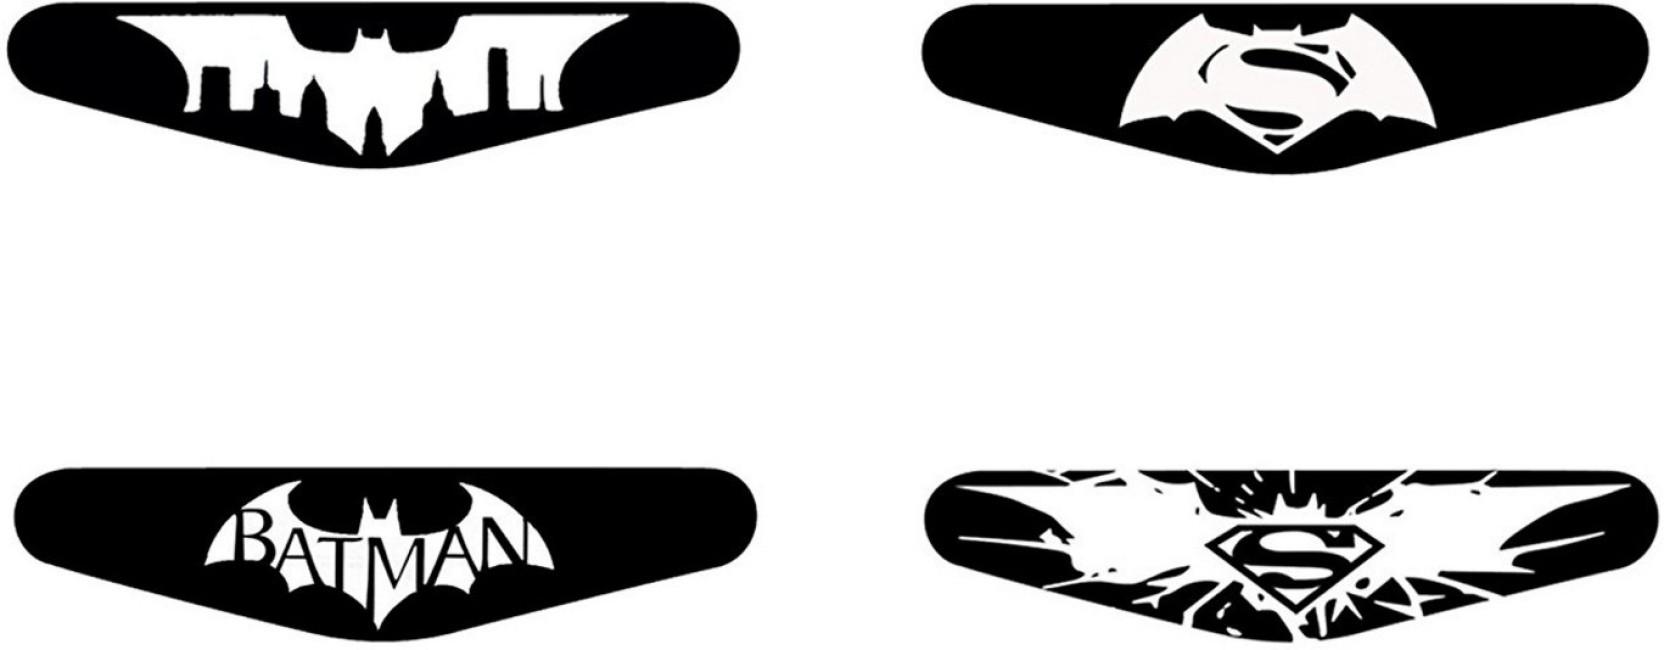 1664x650 Al Pacino Batman Vs Superman Logo Led Light Bar Decal Sticker